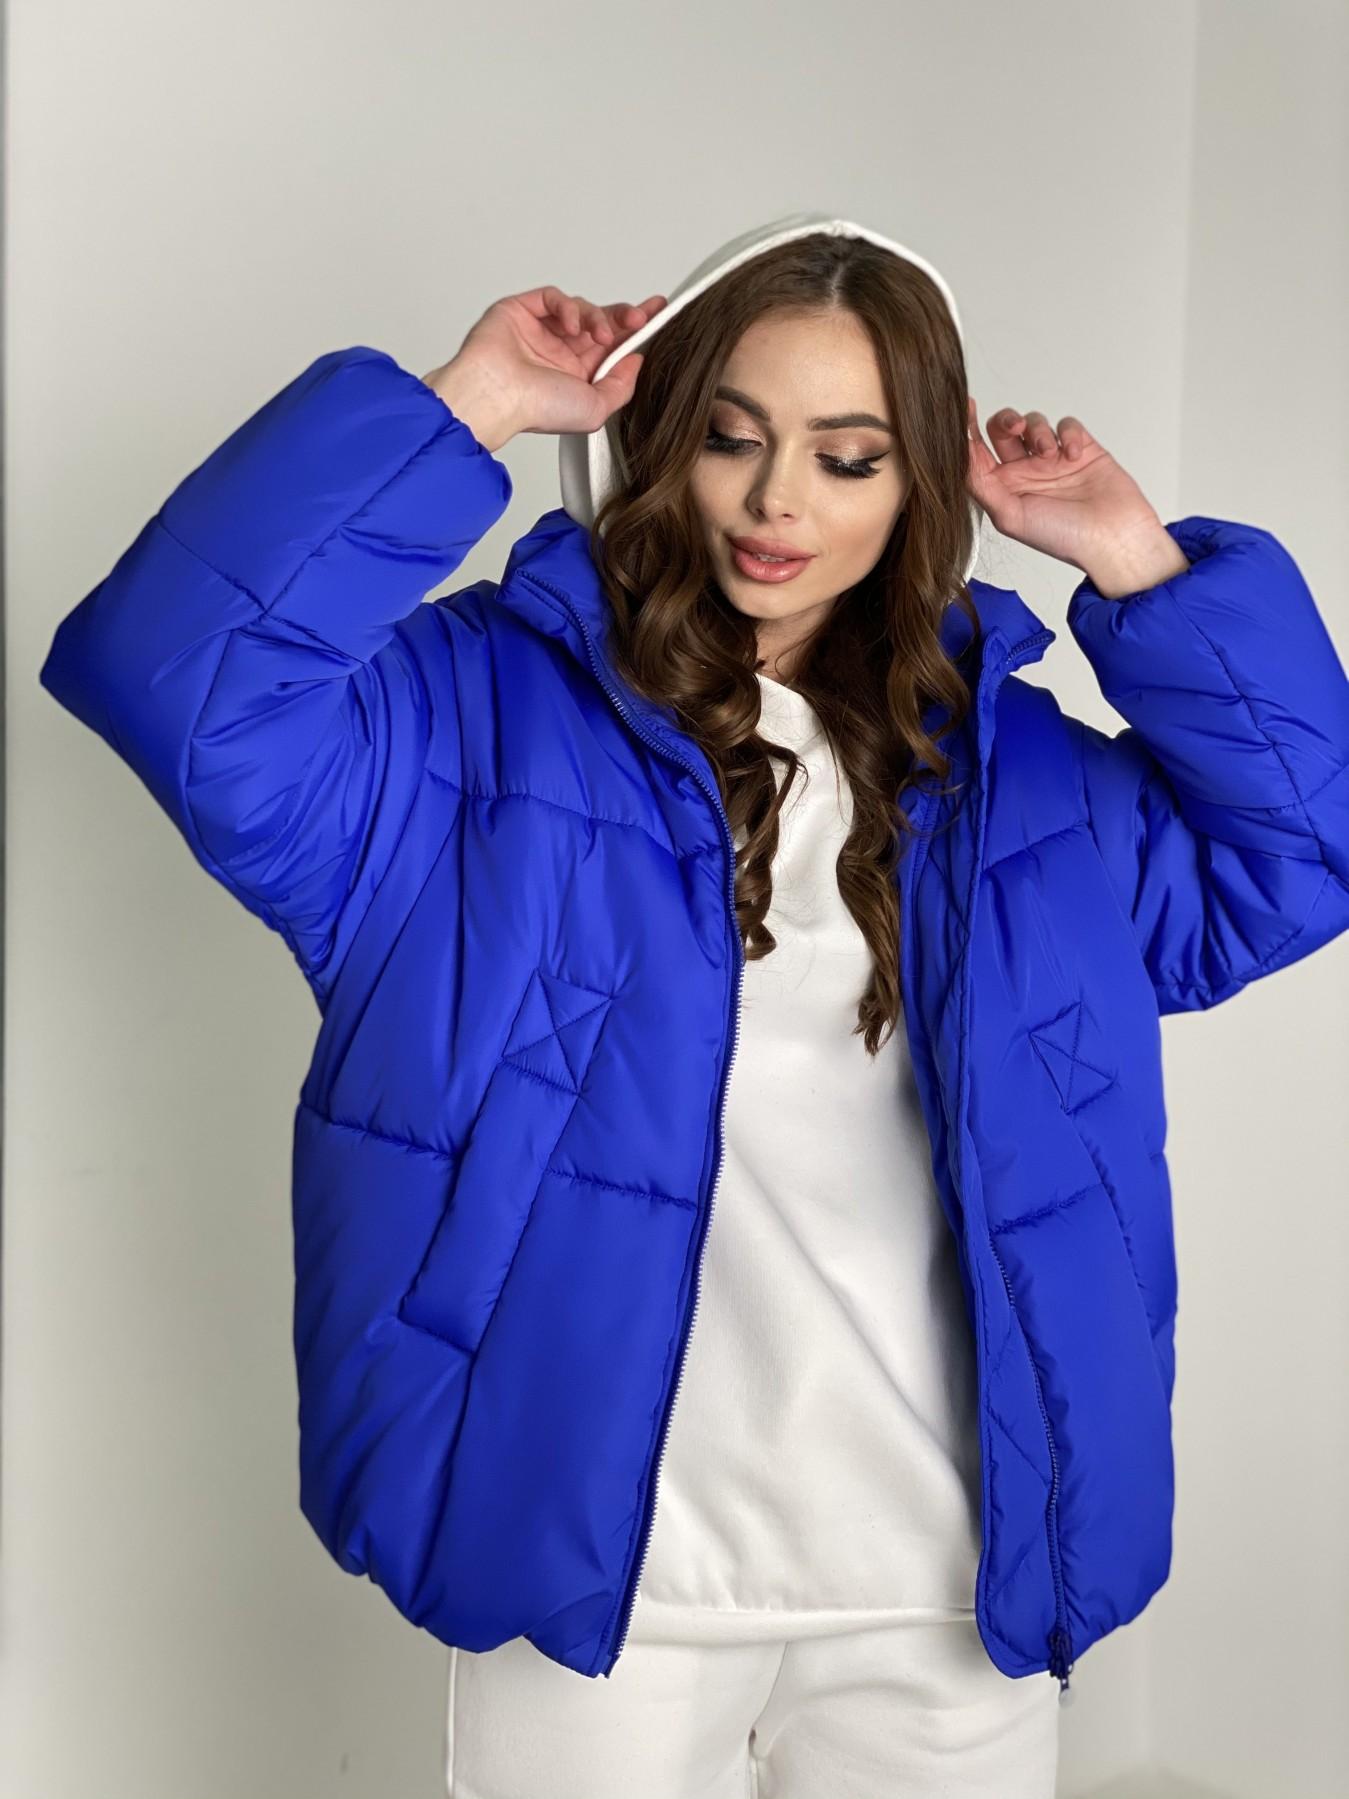 Муд куртка из плащевой ткани 10509 АРТ. 46852 Цвет: Электрик - фото 7, интернет магазин tm-modus.ru